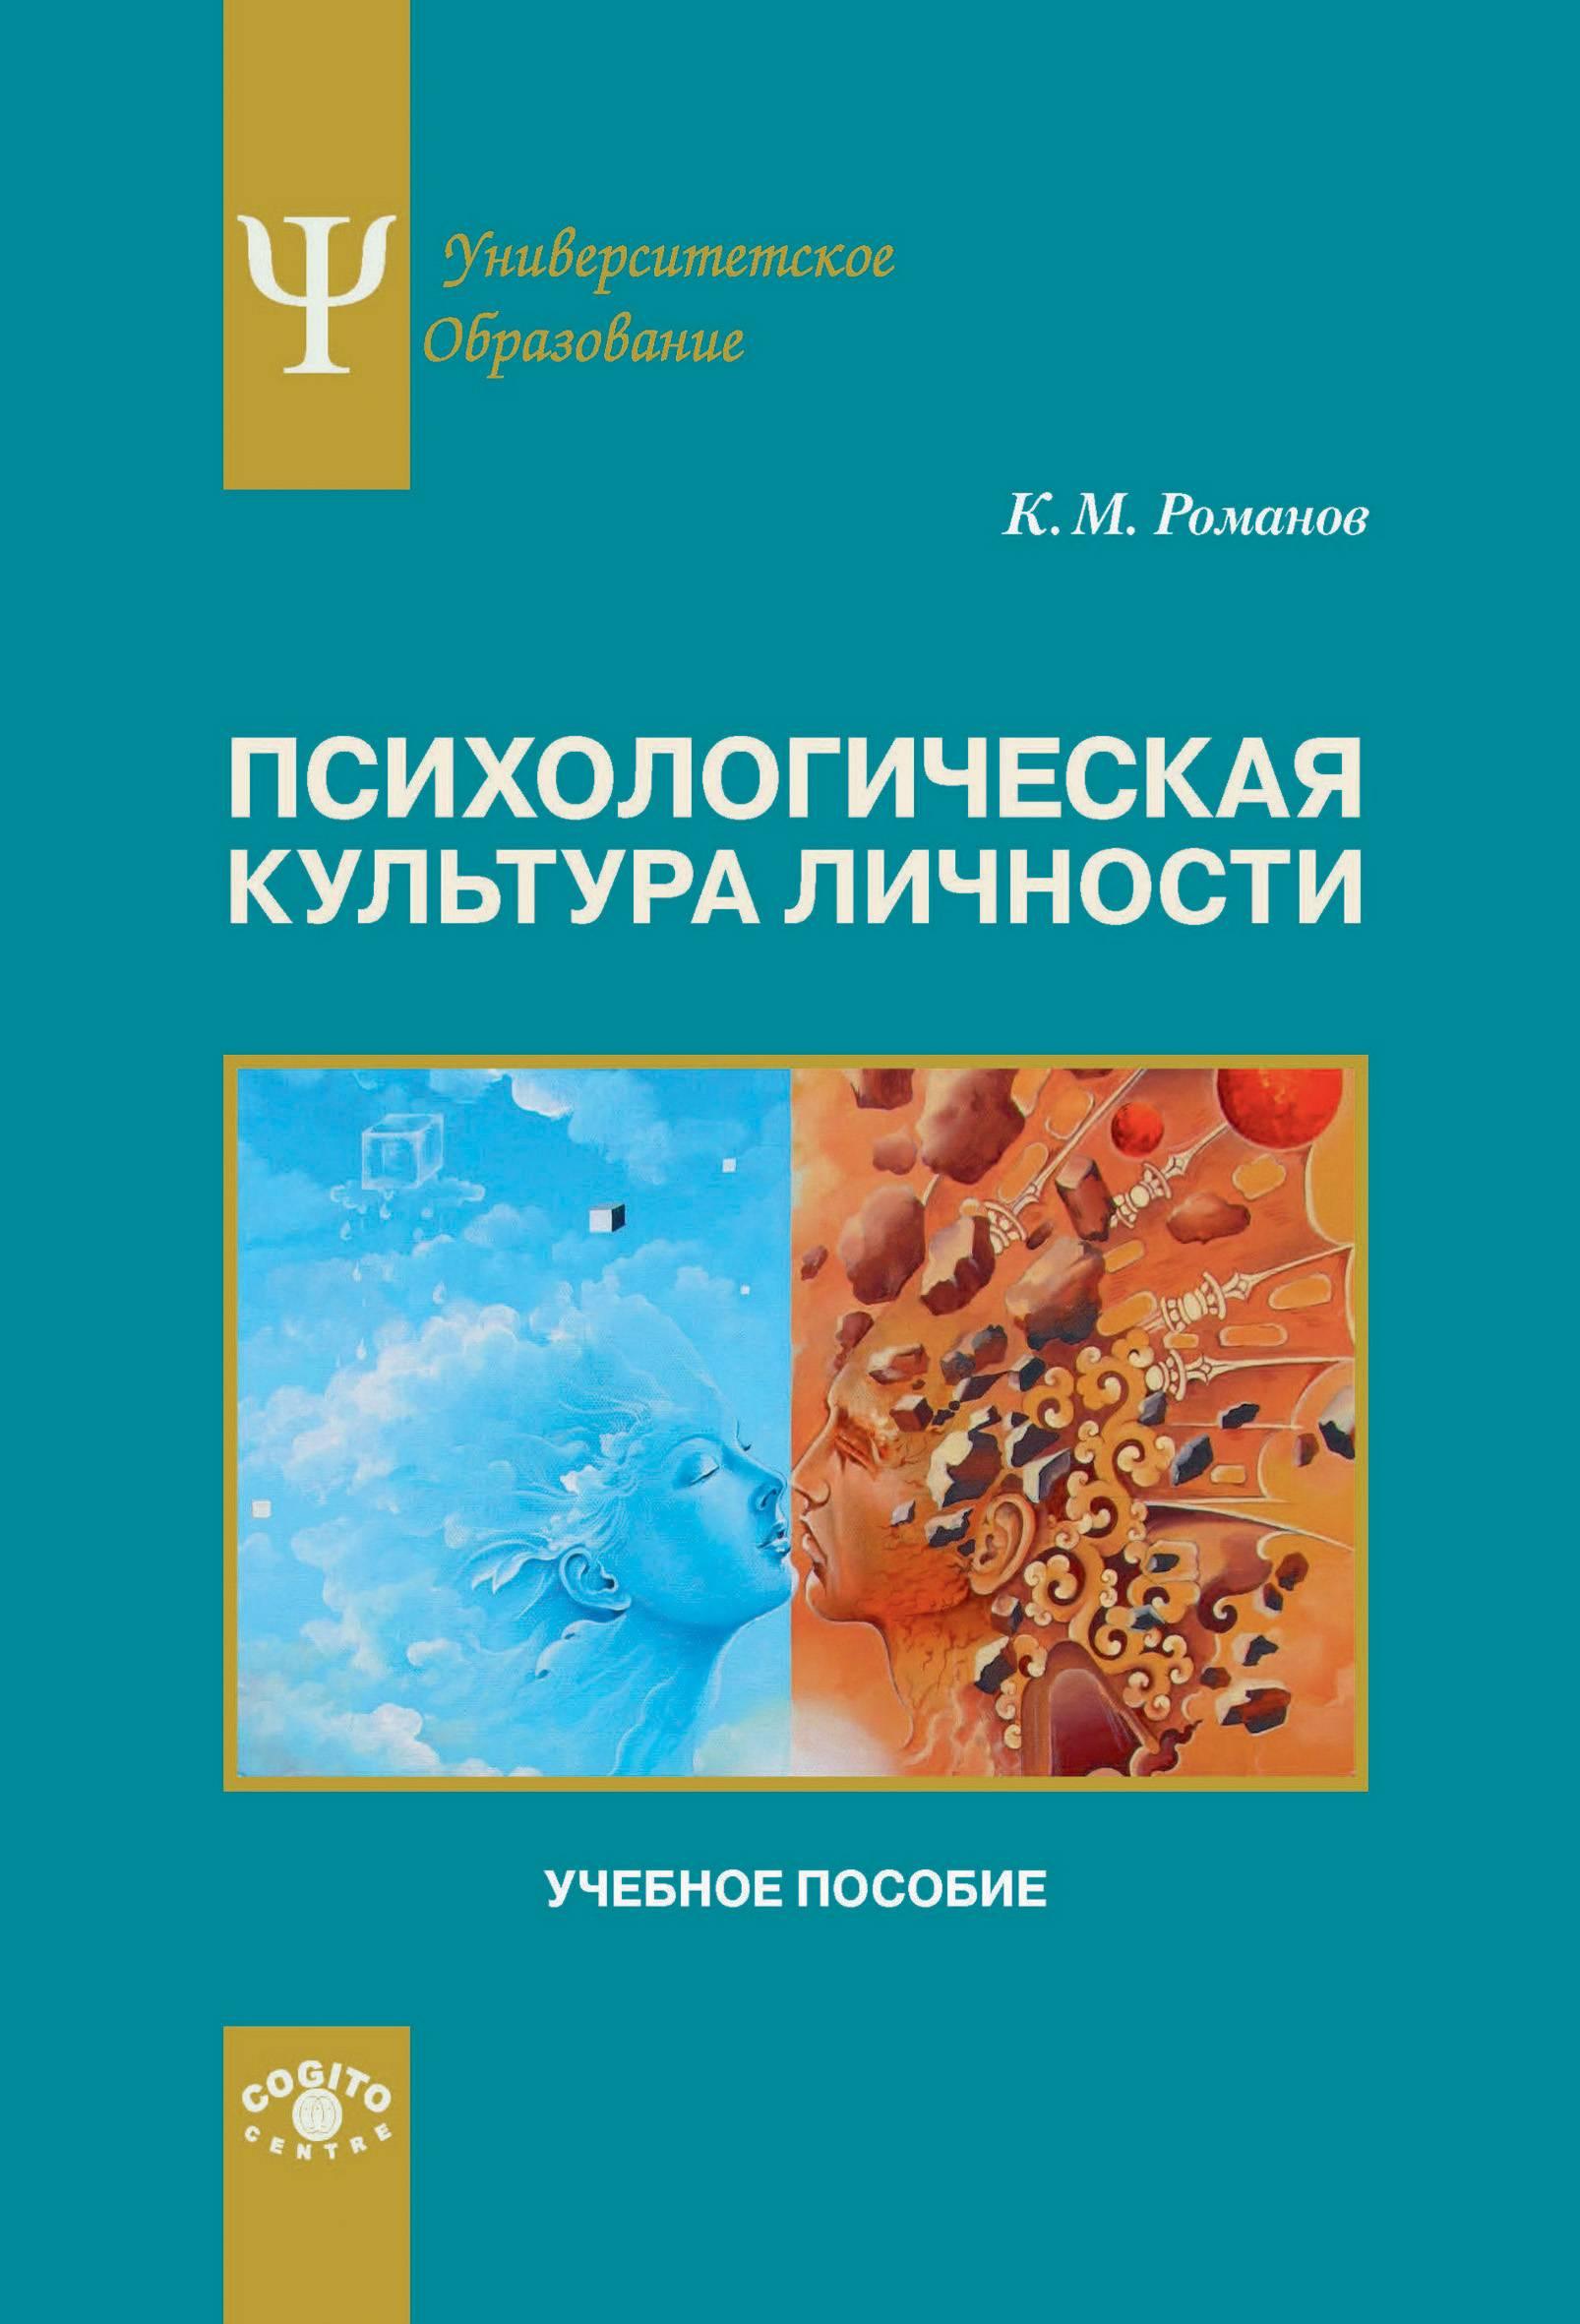 Культурная психология - cultural psychology - qwe.wiki